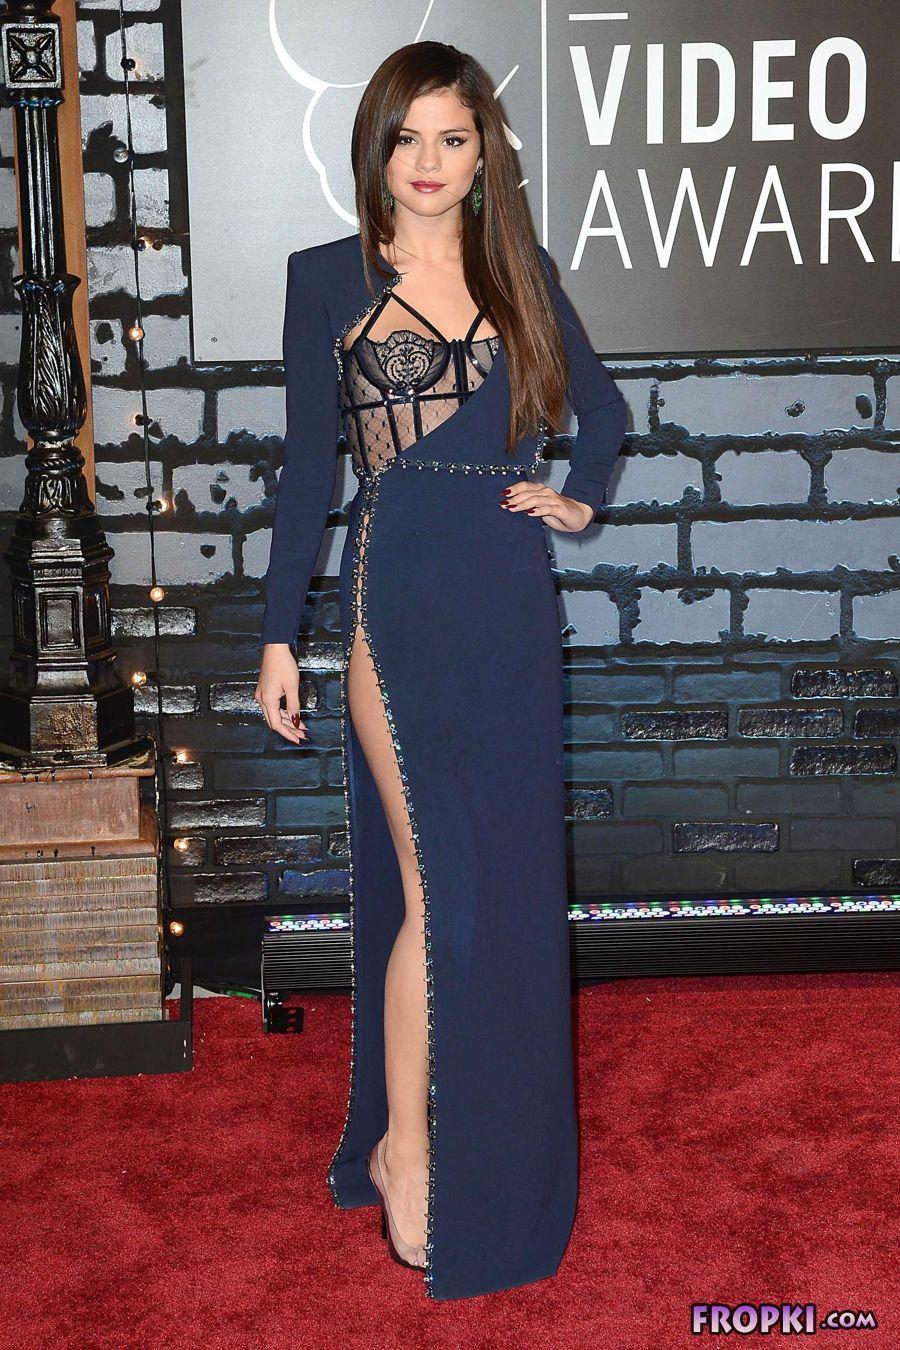 Selena Gomez - 2013 MTV Video Music Awards in NY AdbIls70